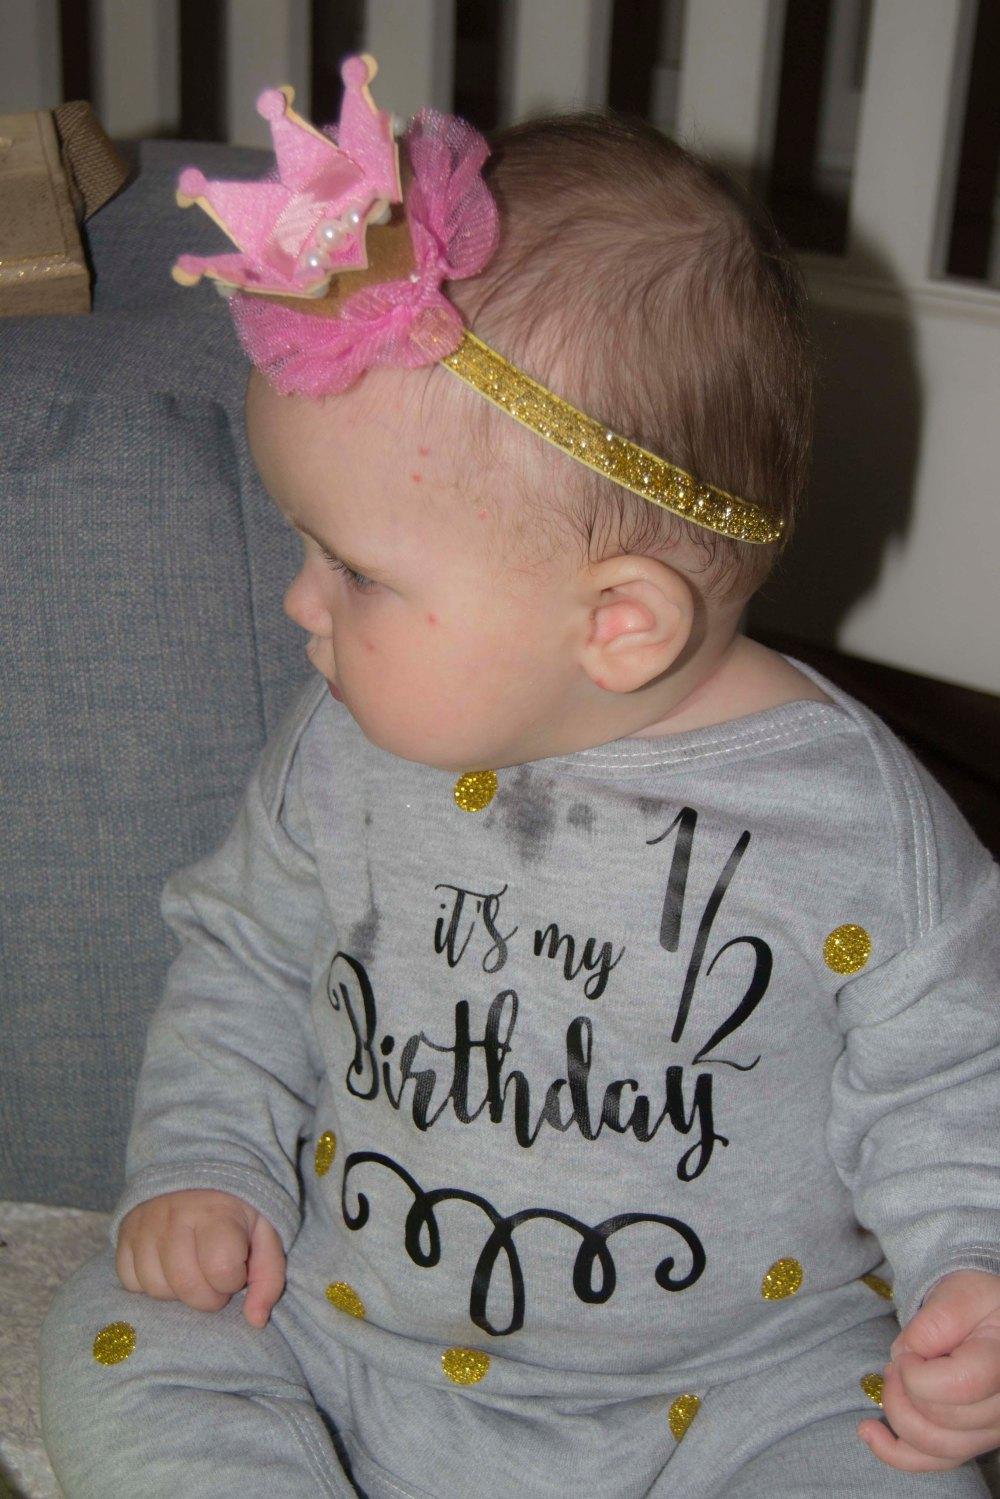 6-month-birthday-7s